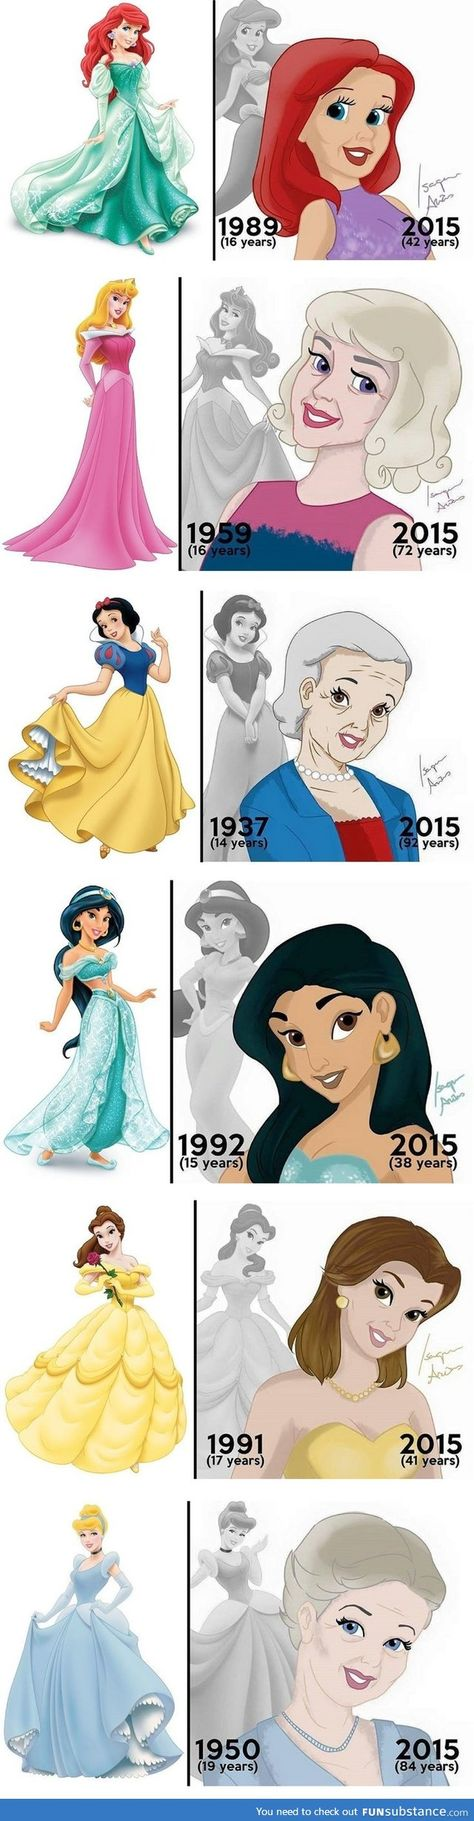 Disney princesses in 2015 - FunSubstance